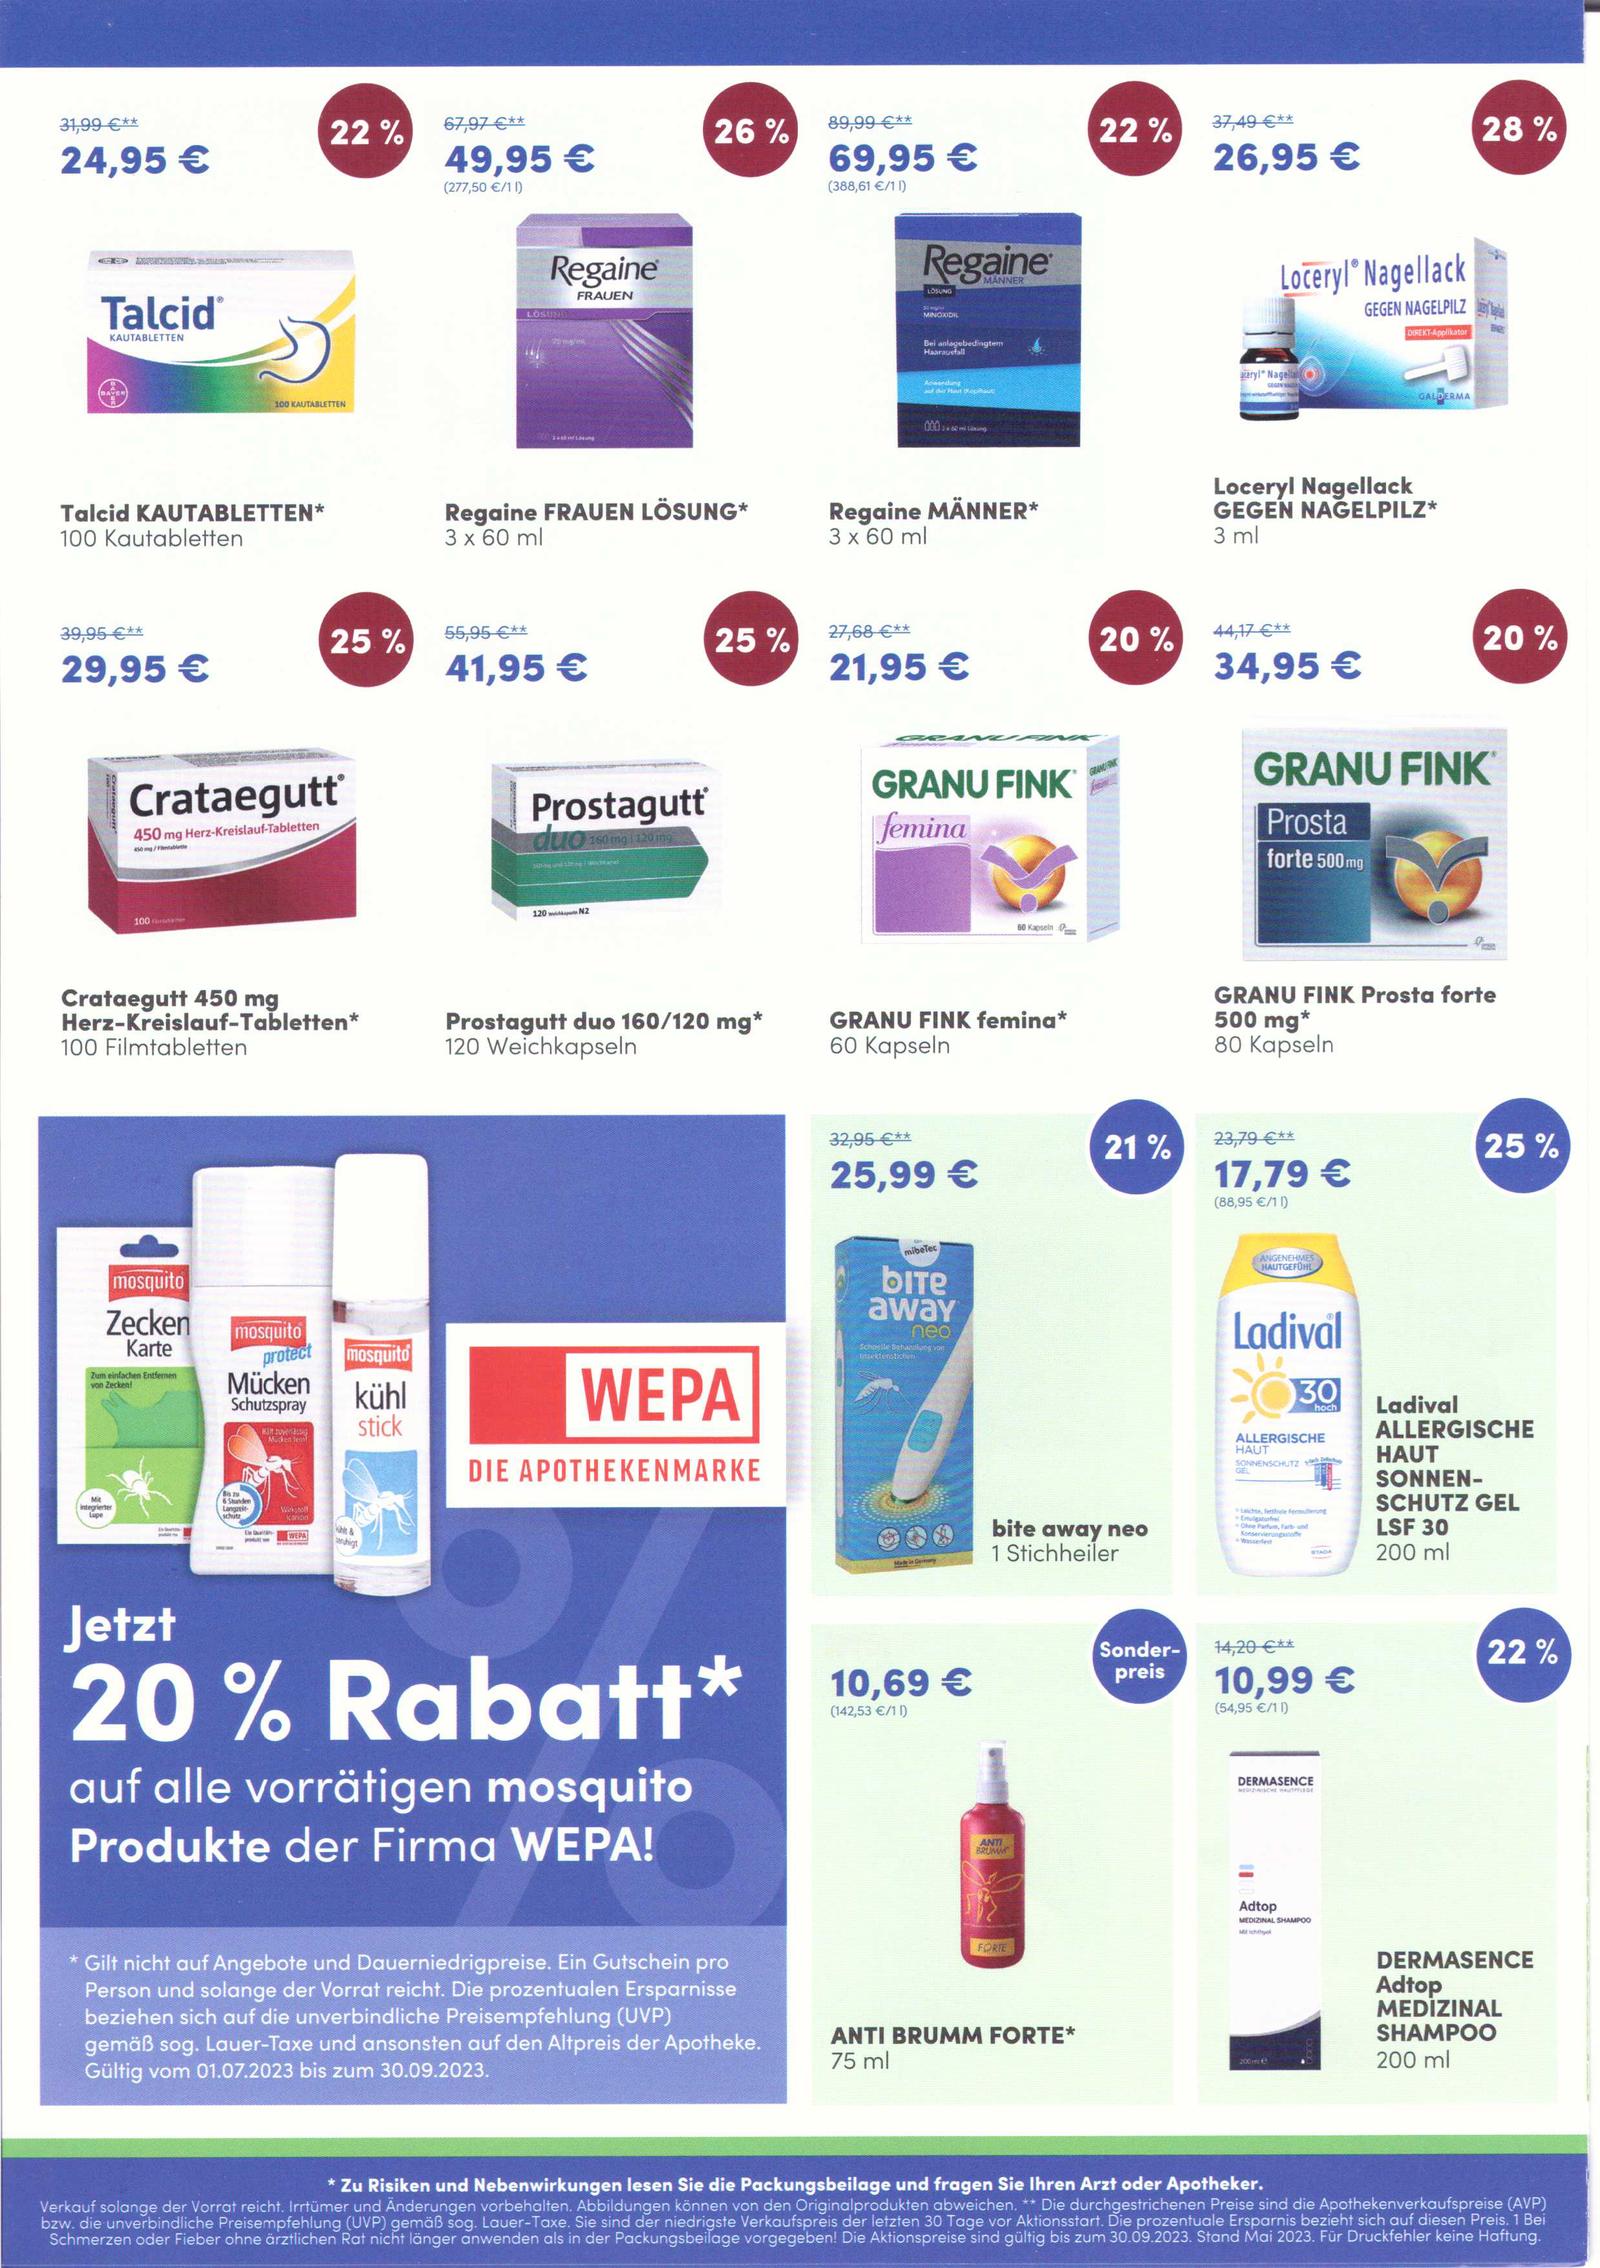 https://mein-uploads.apocdn.net/1117/leaflets/1117_flyer-Seite5.png